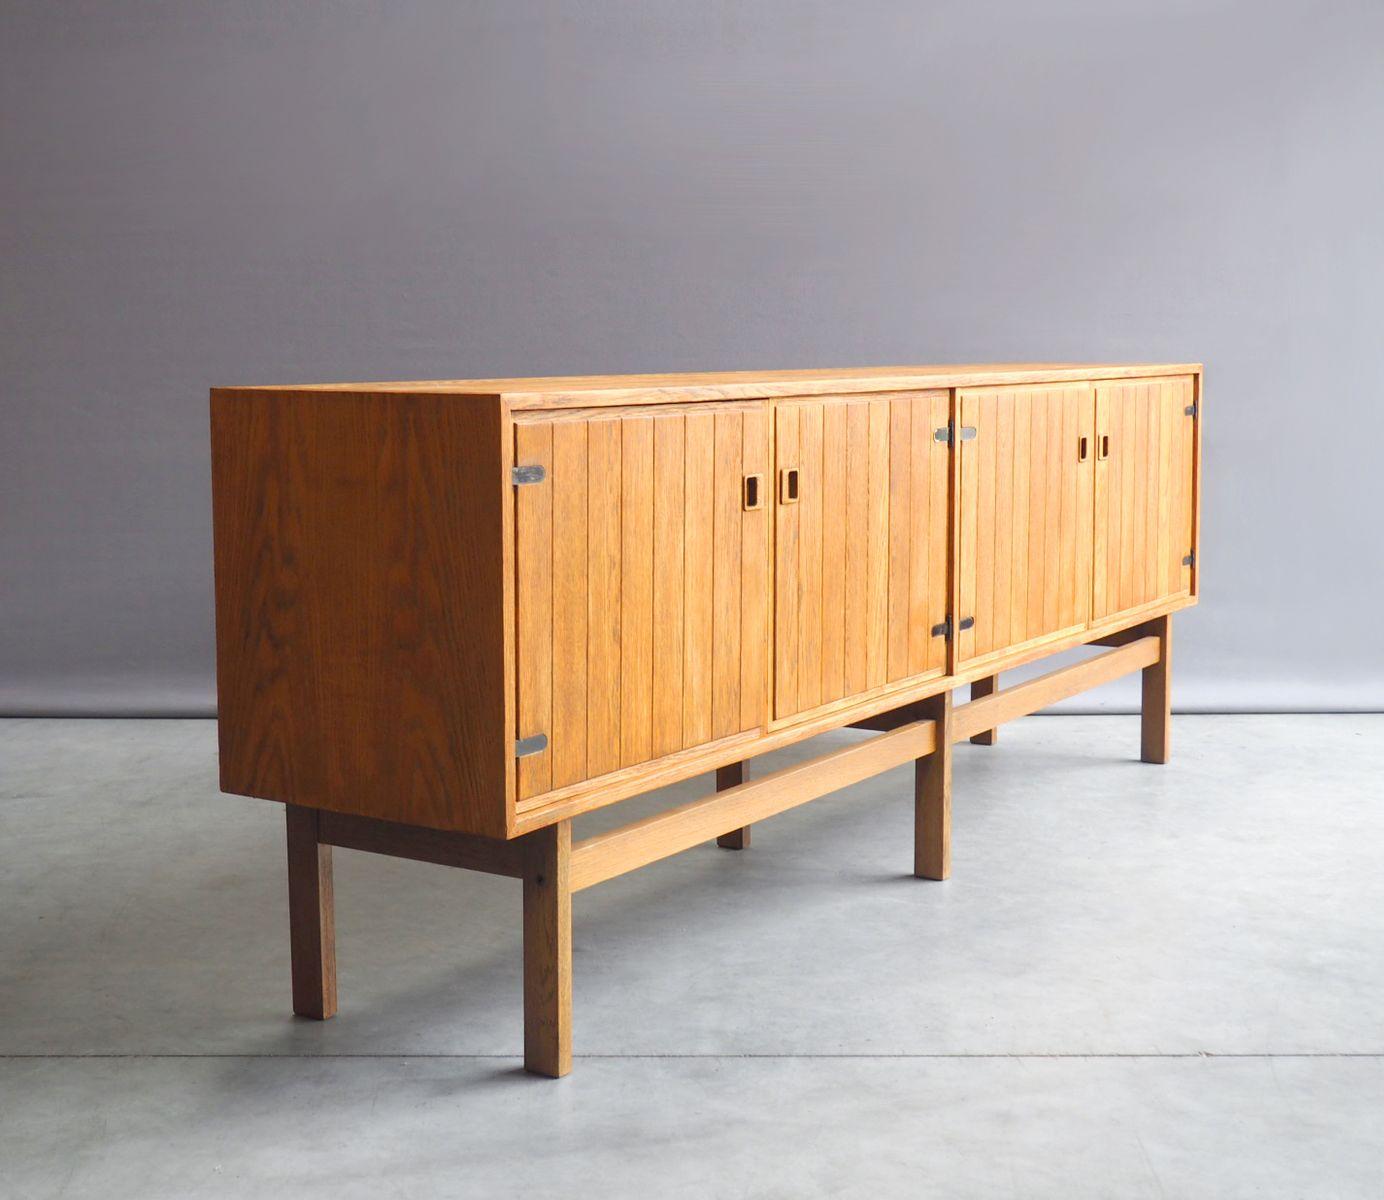 gro es d nisches eichenholz sideboard 1960er bei pamono. Black Bedroom Furniture Sets. Home Design Ideas